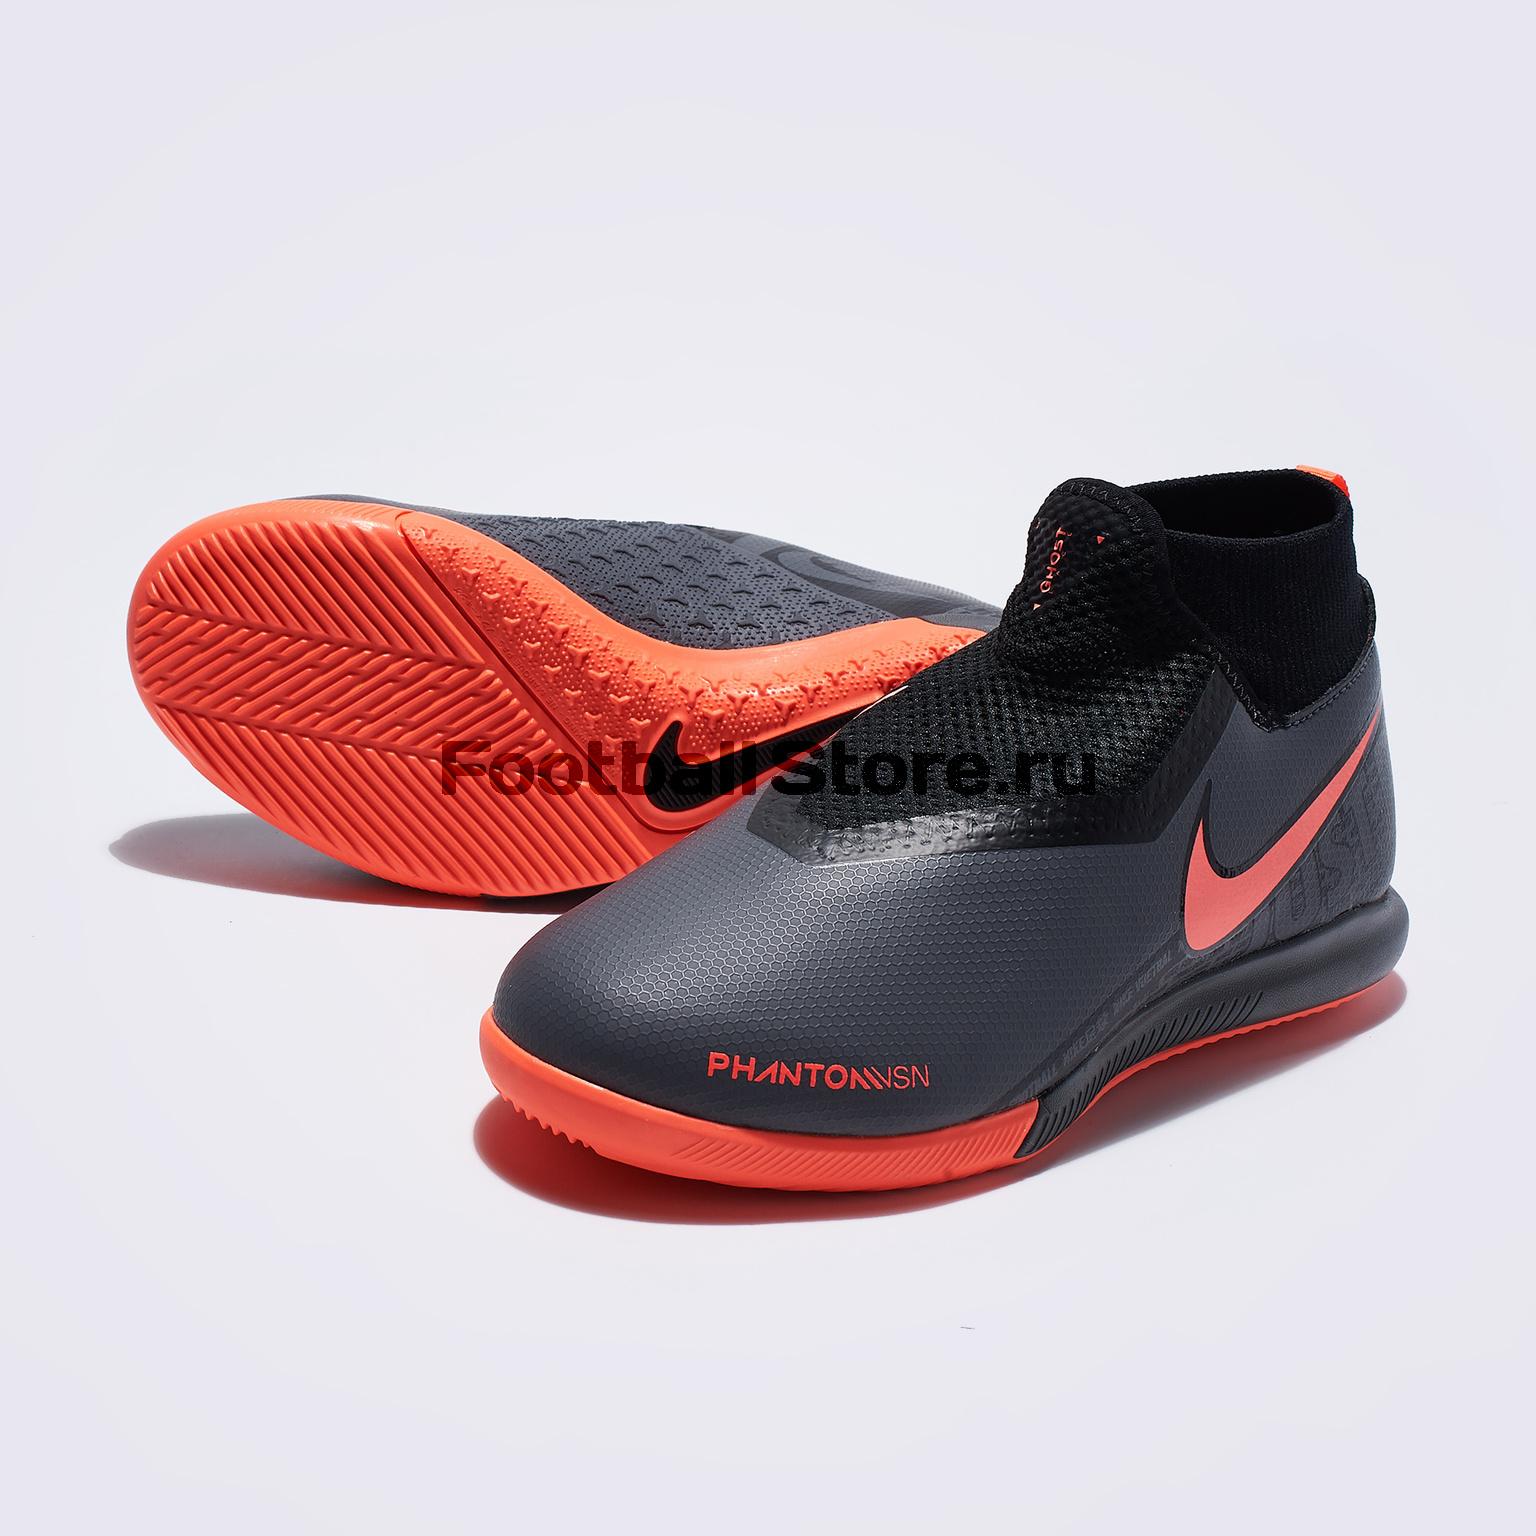 Футзалки детские Nike Phantom Vision Academy DF IC AO3290-080 футзалки nike superflyx 6 academy ic ah7369 701